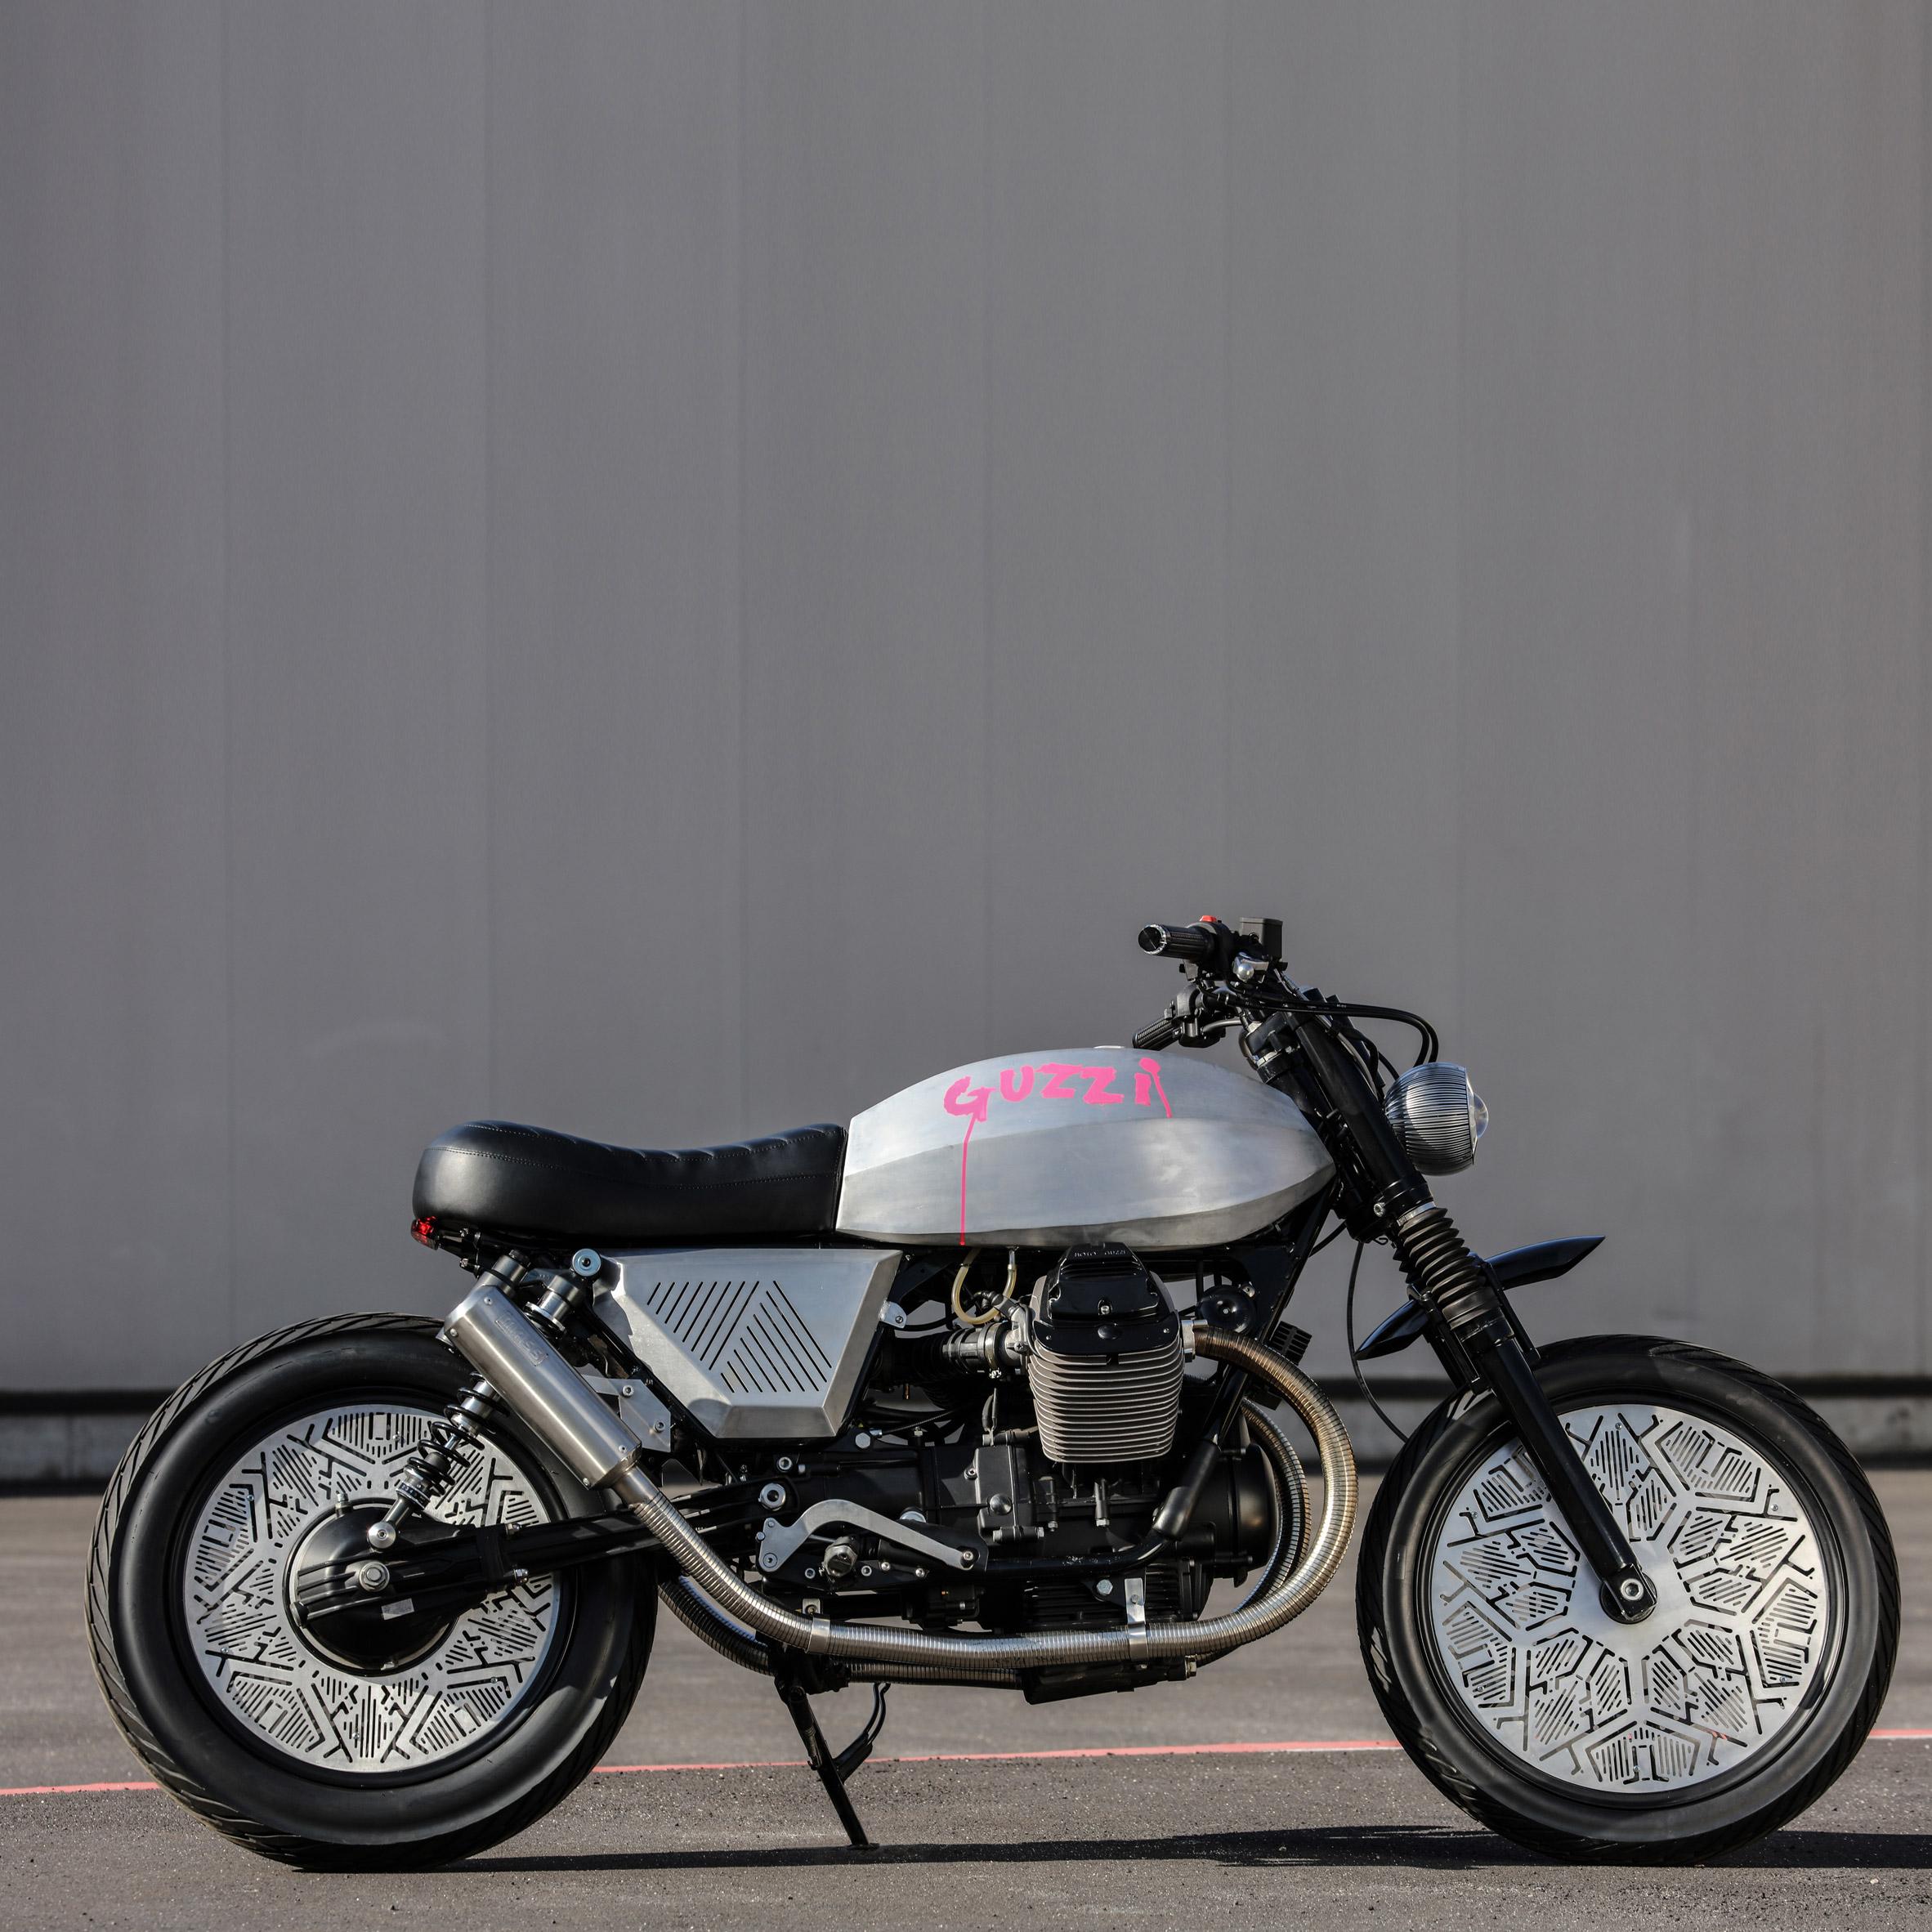 Tomoto Tom Dixon motorcycle for Moto Guzzi